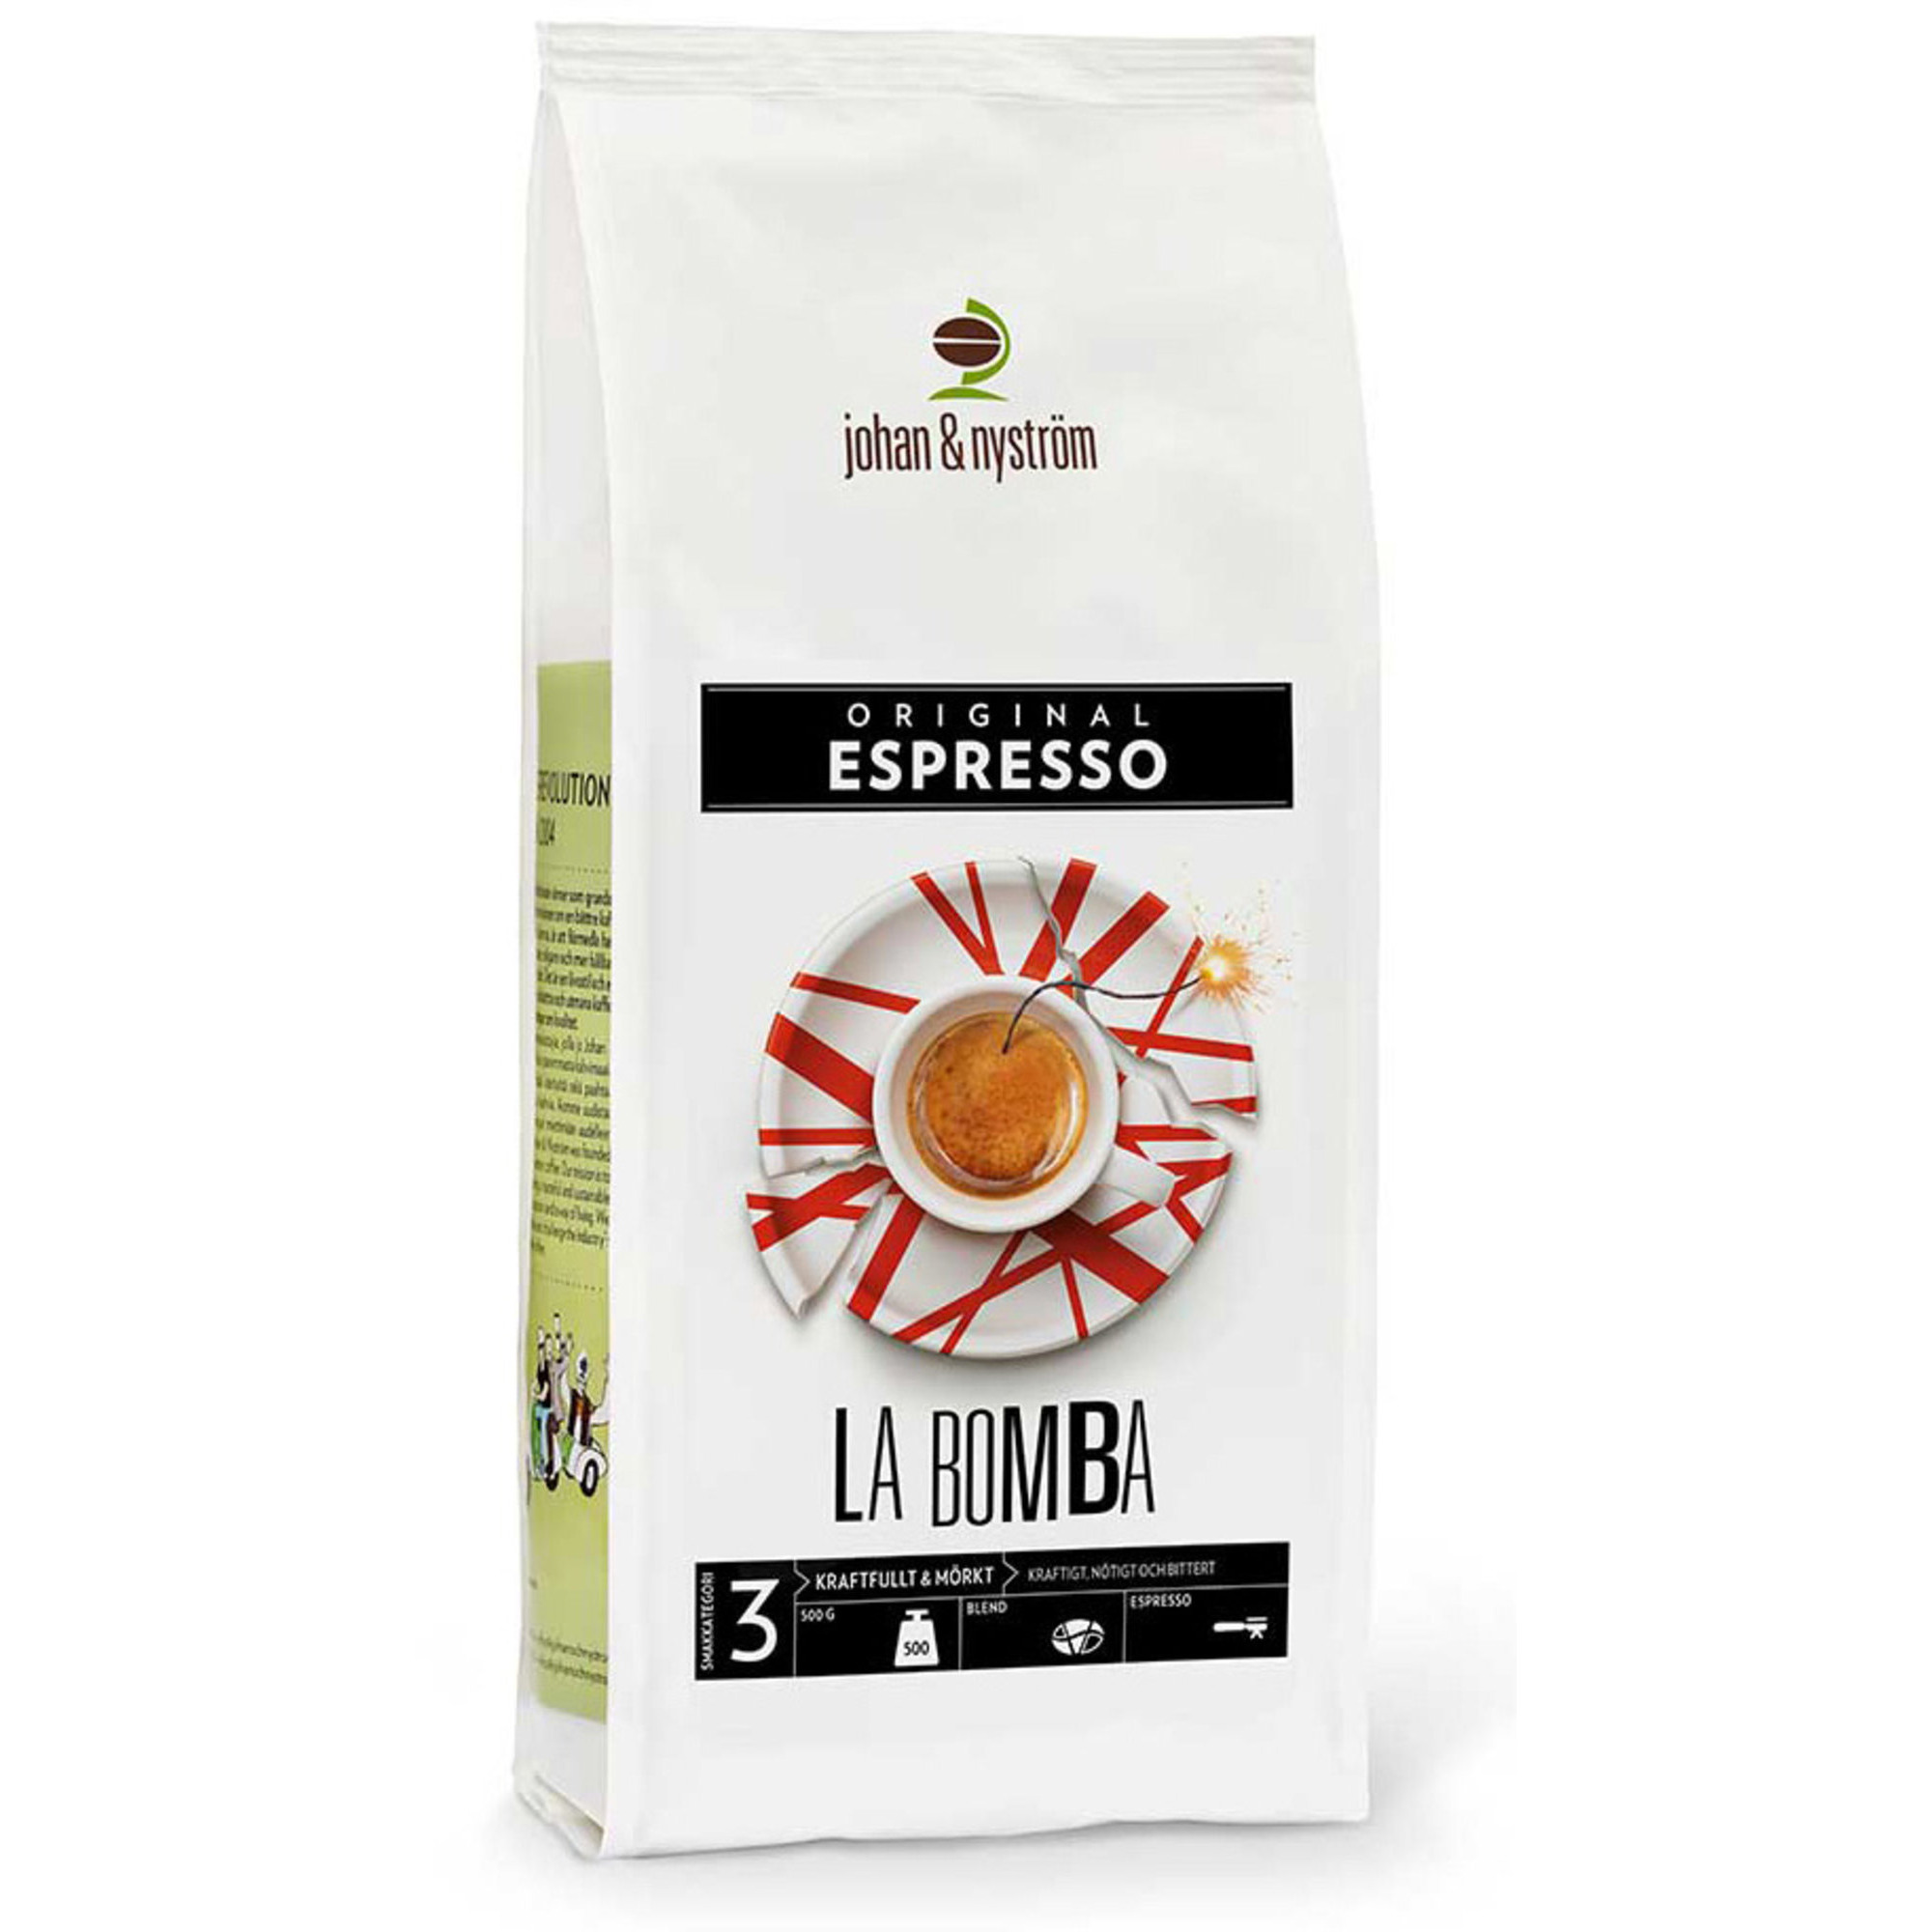 Johan & Nyström Espresso La Bomba 500g